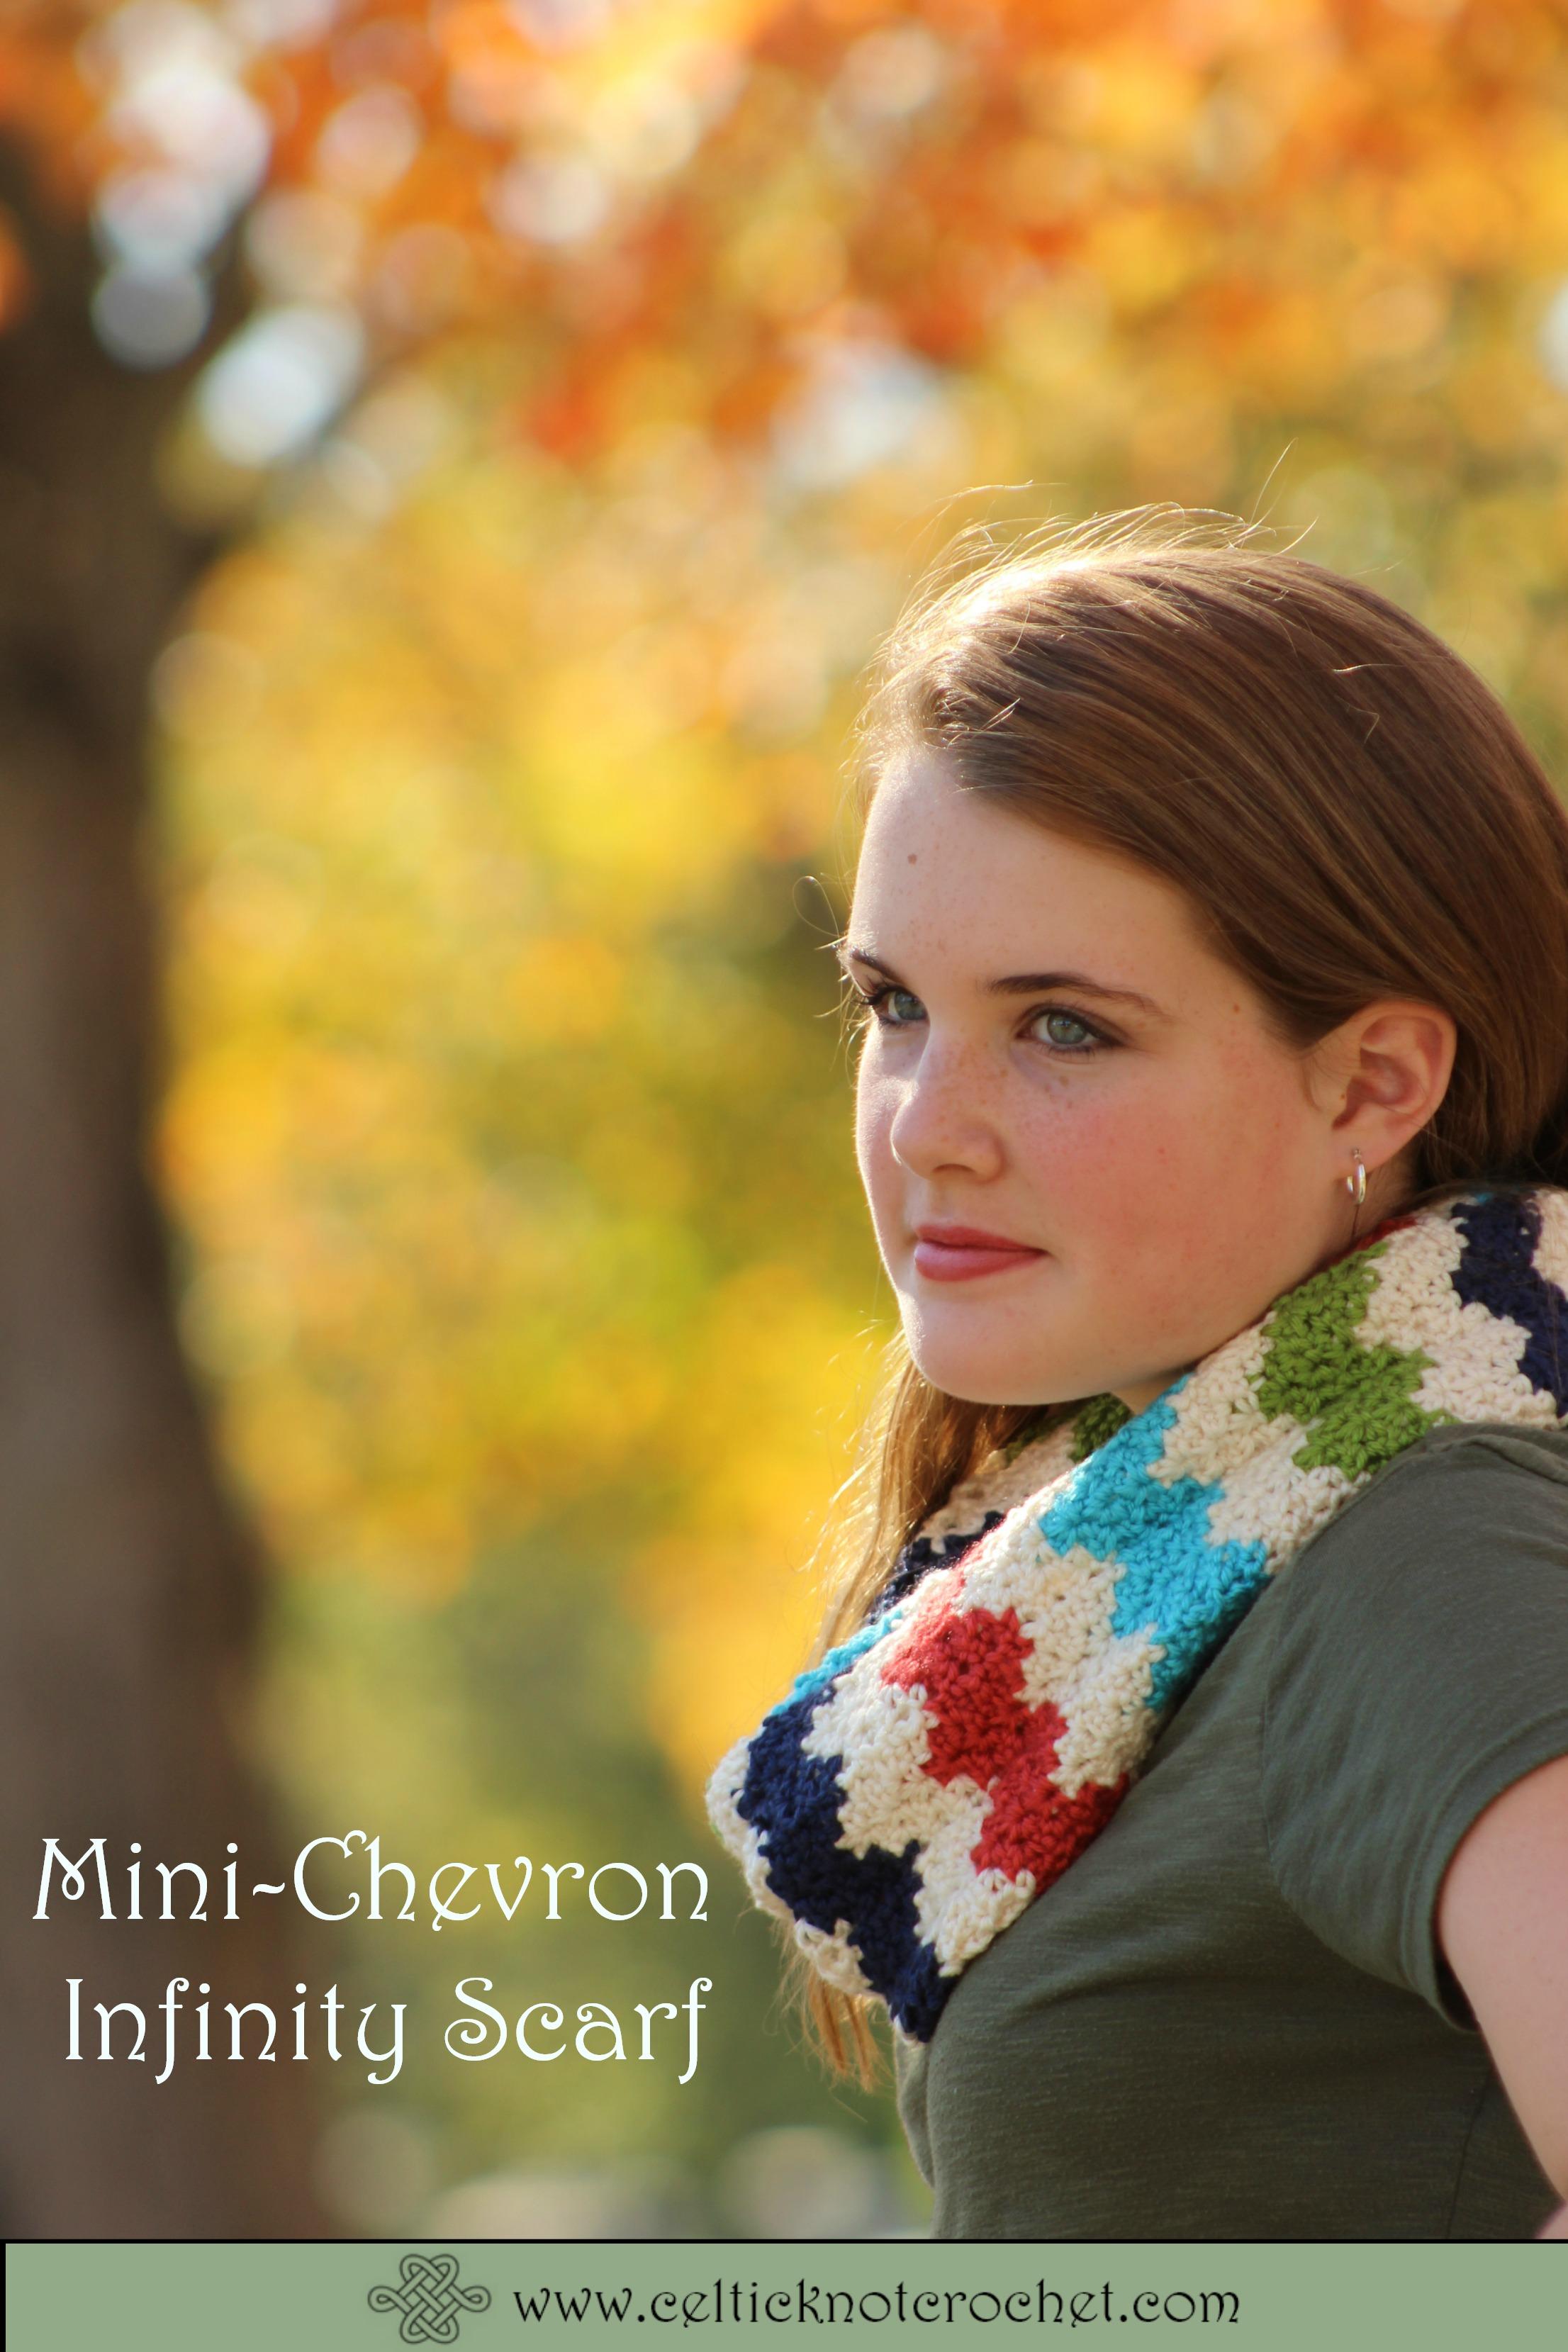 Mini-Chevron crochet scarf